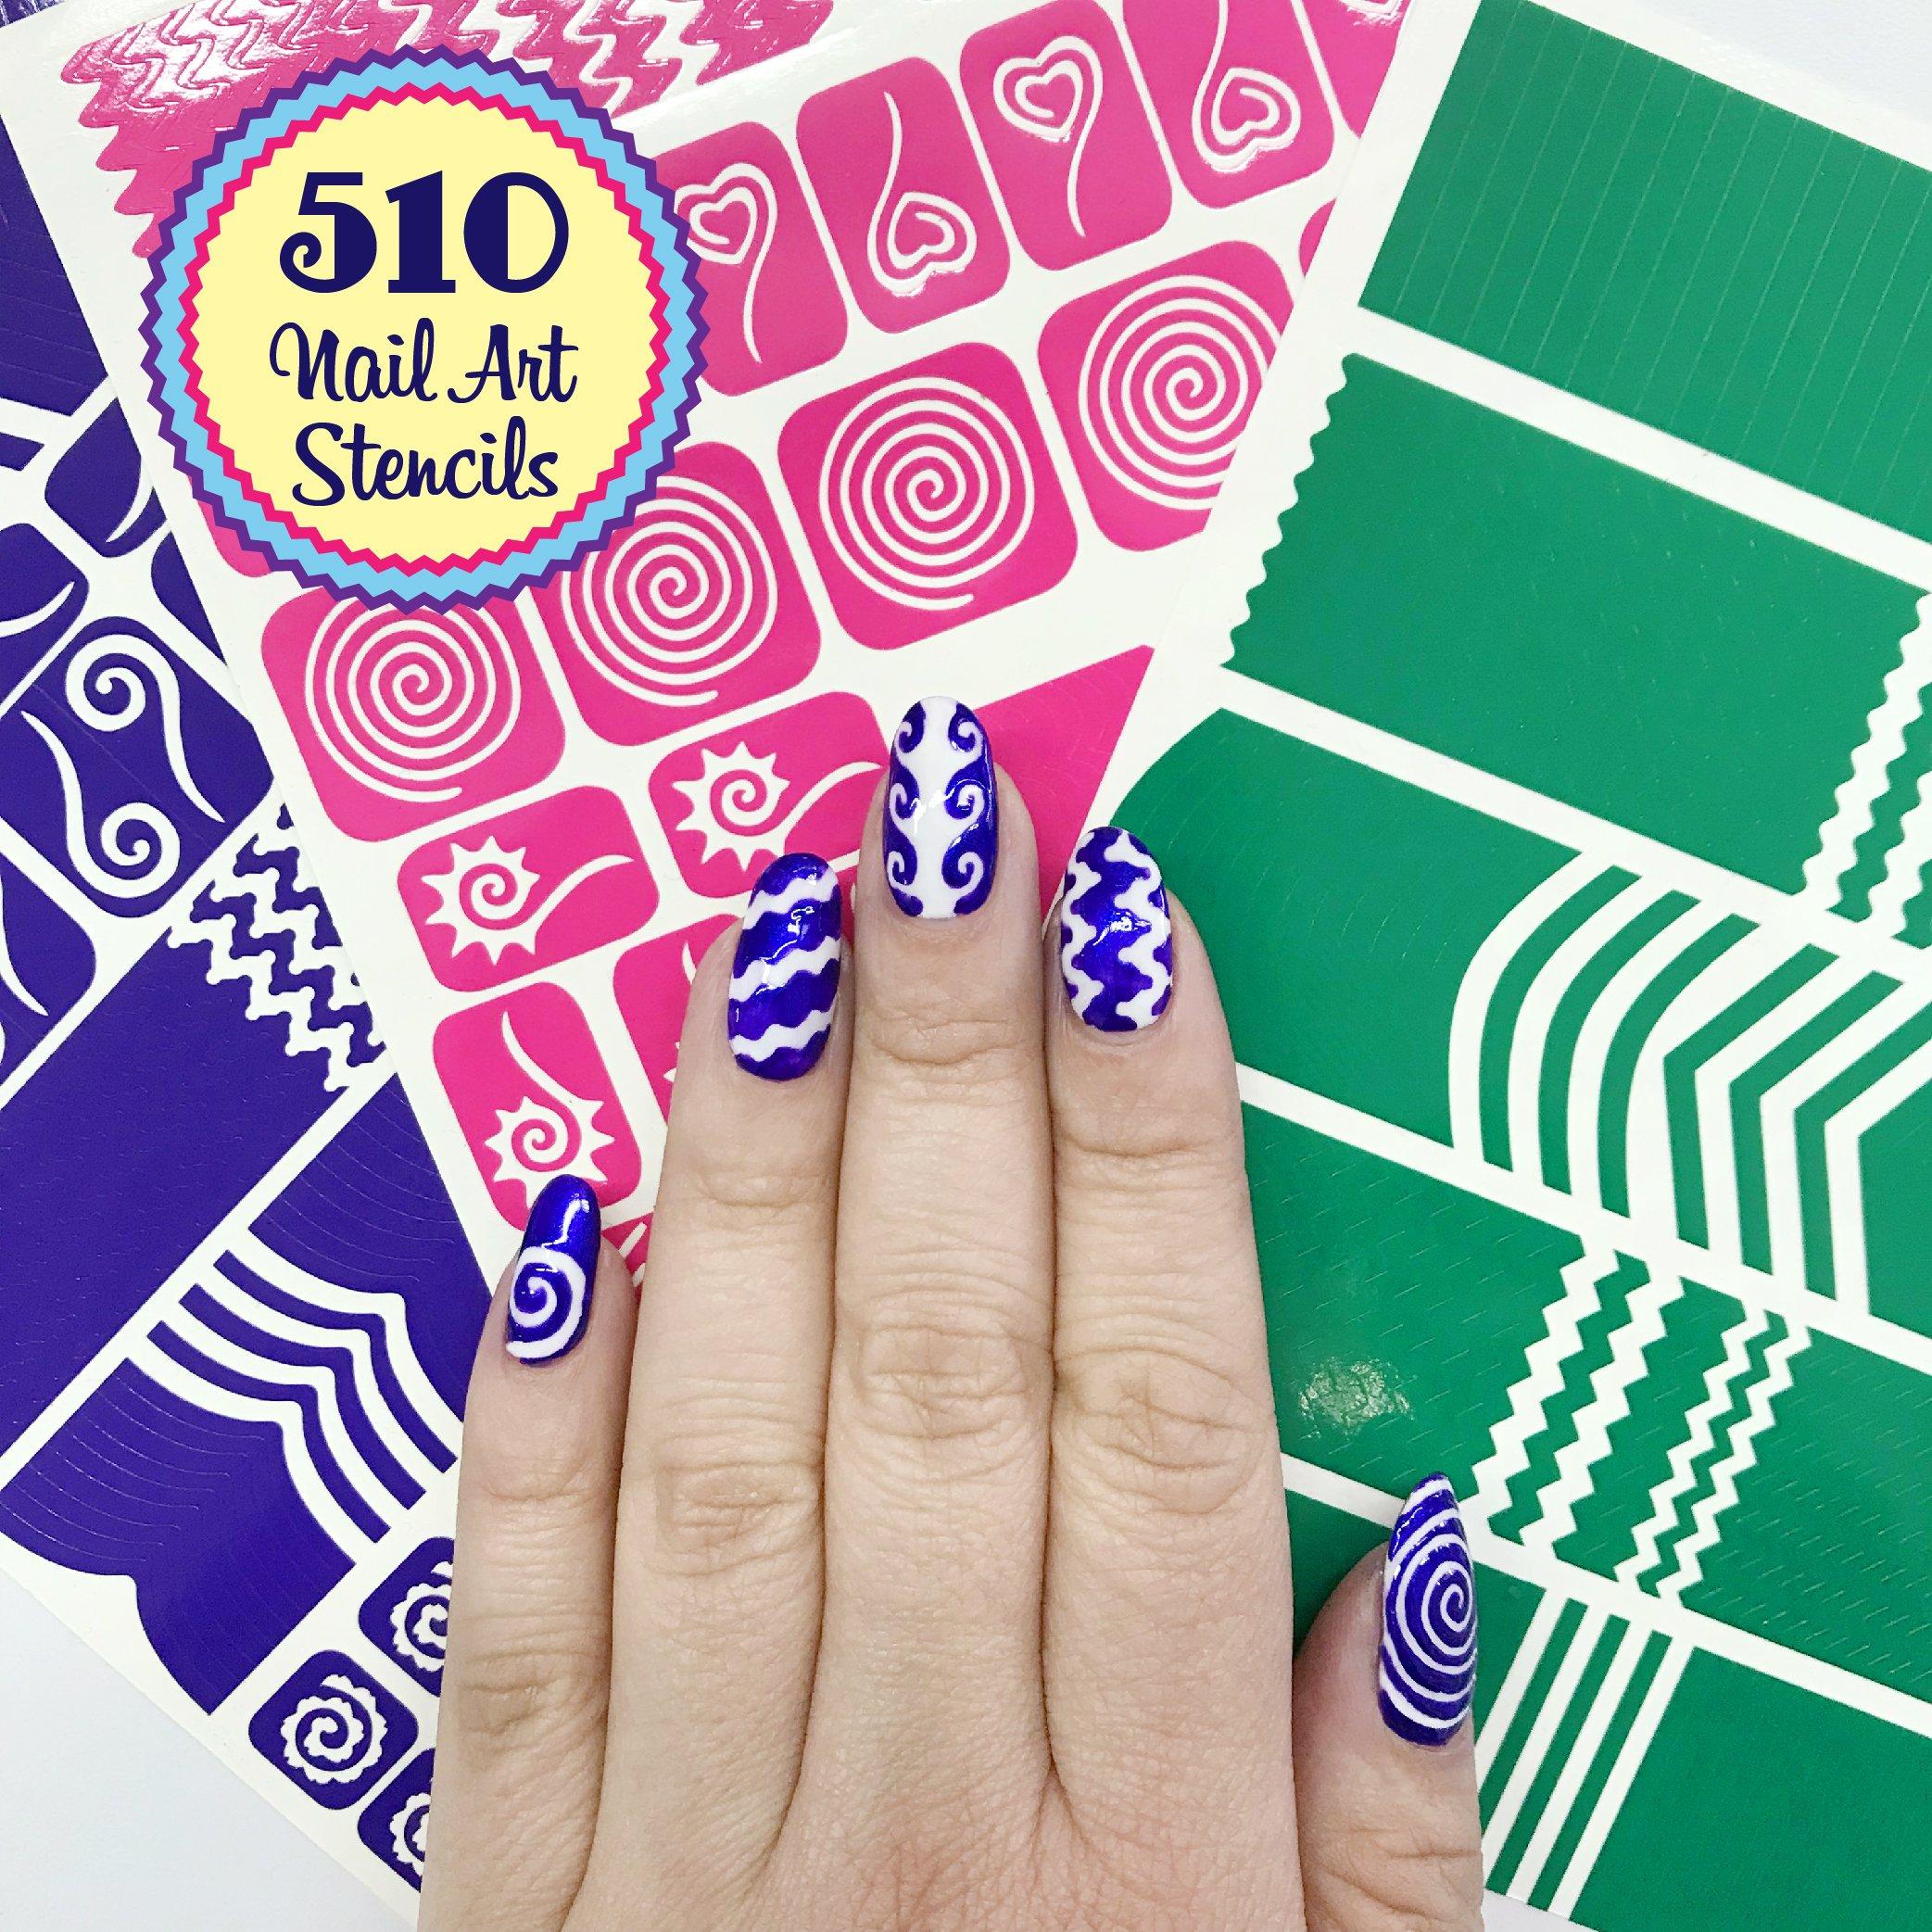 Amazon.com: 439 Nail Art Stencils Vinyl - 21 Different Shapes ...